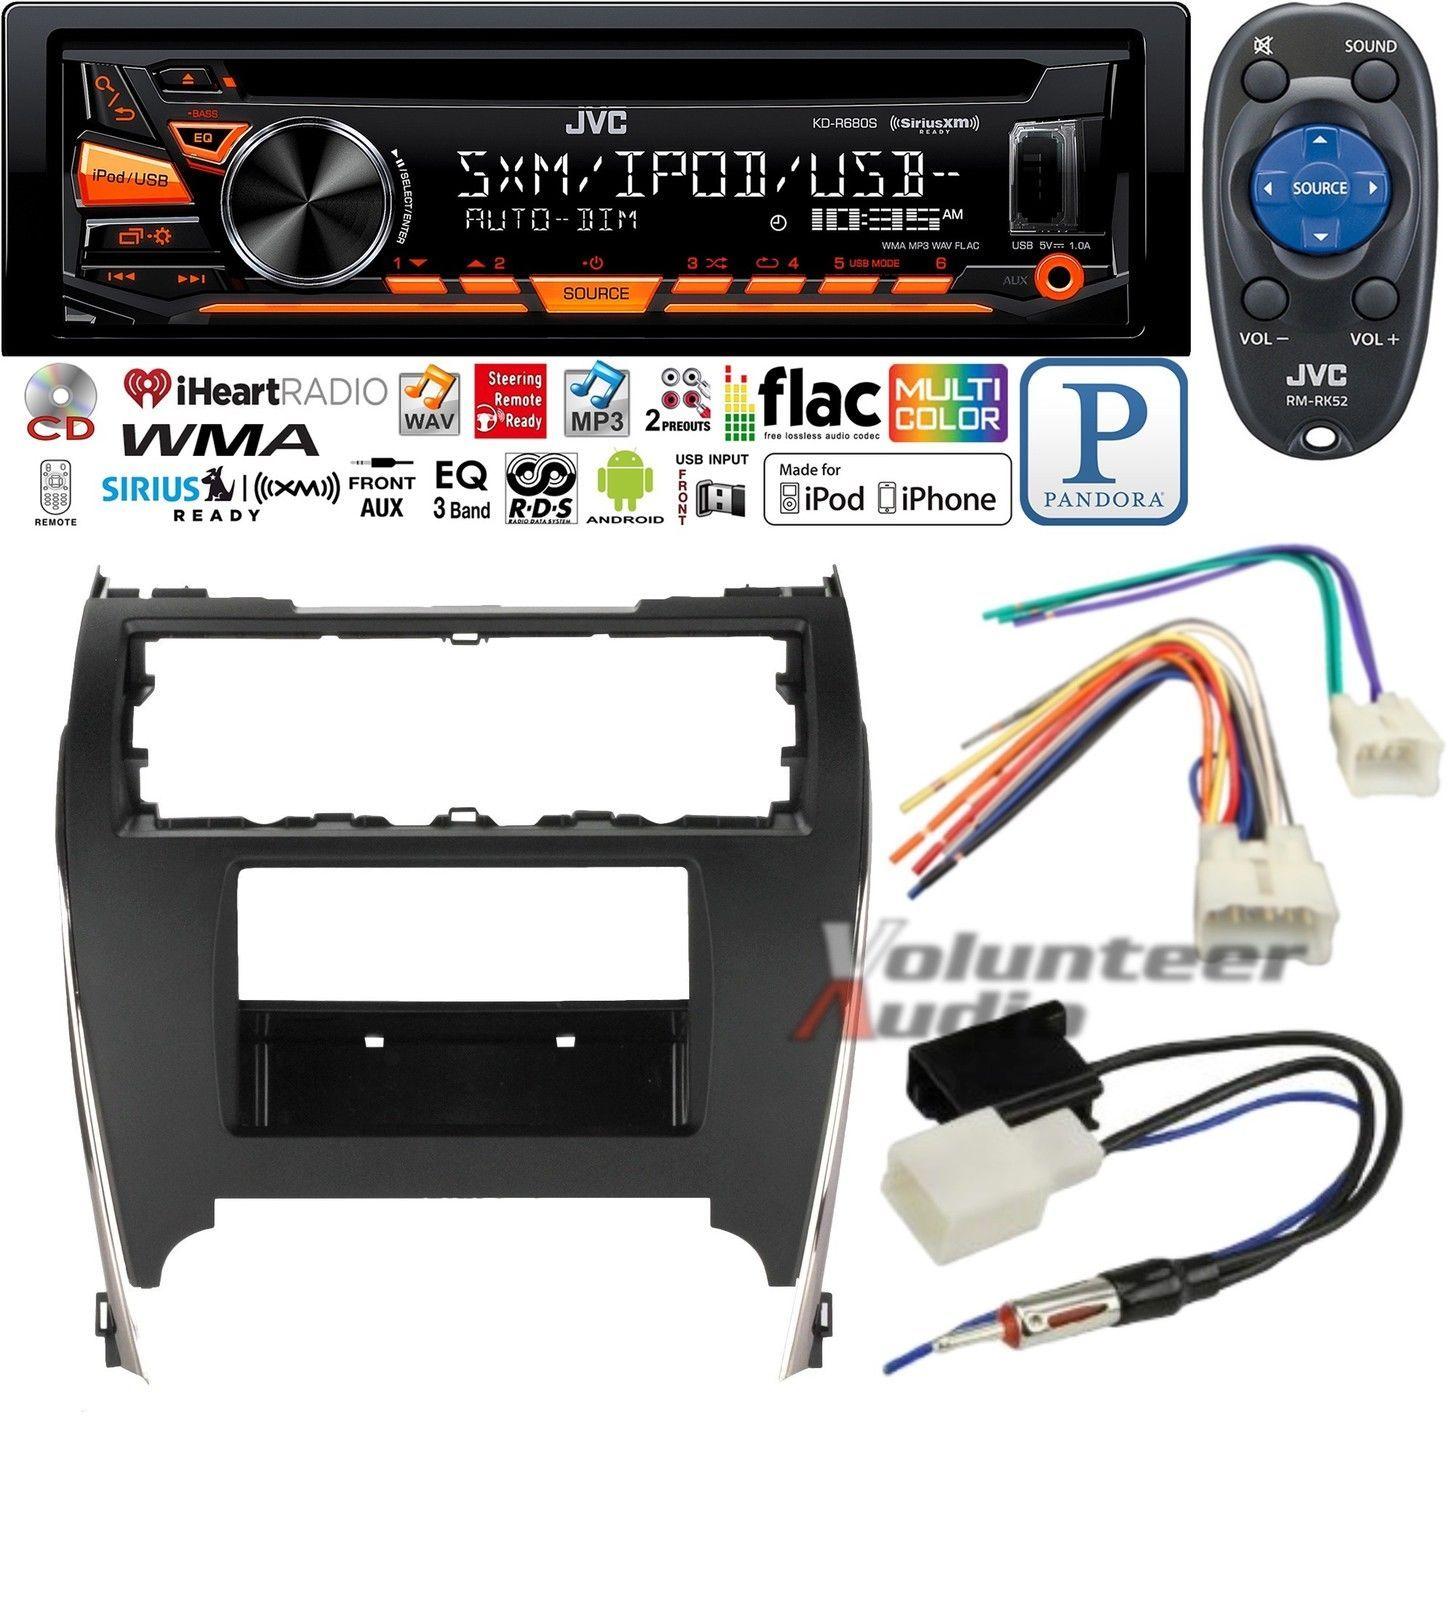 Nice Amazing Jvc Car Radio Stereo Cd Player Dash Install Mounting Wiring Harness Kit Usb Aux Mp3